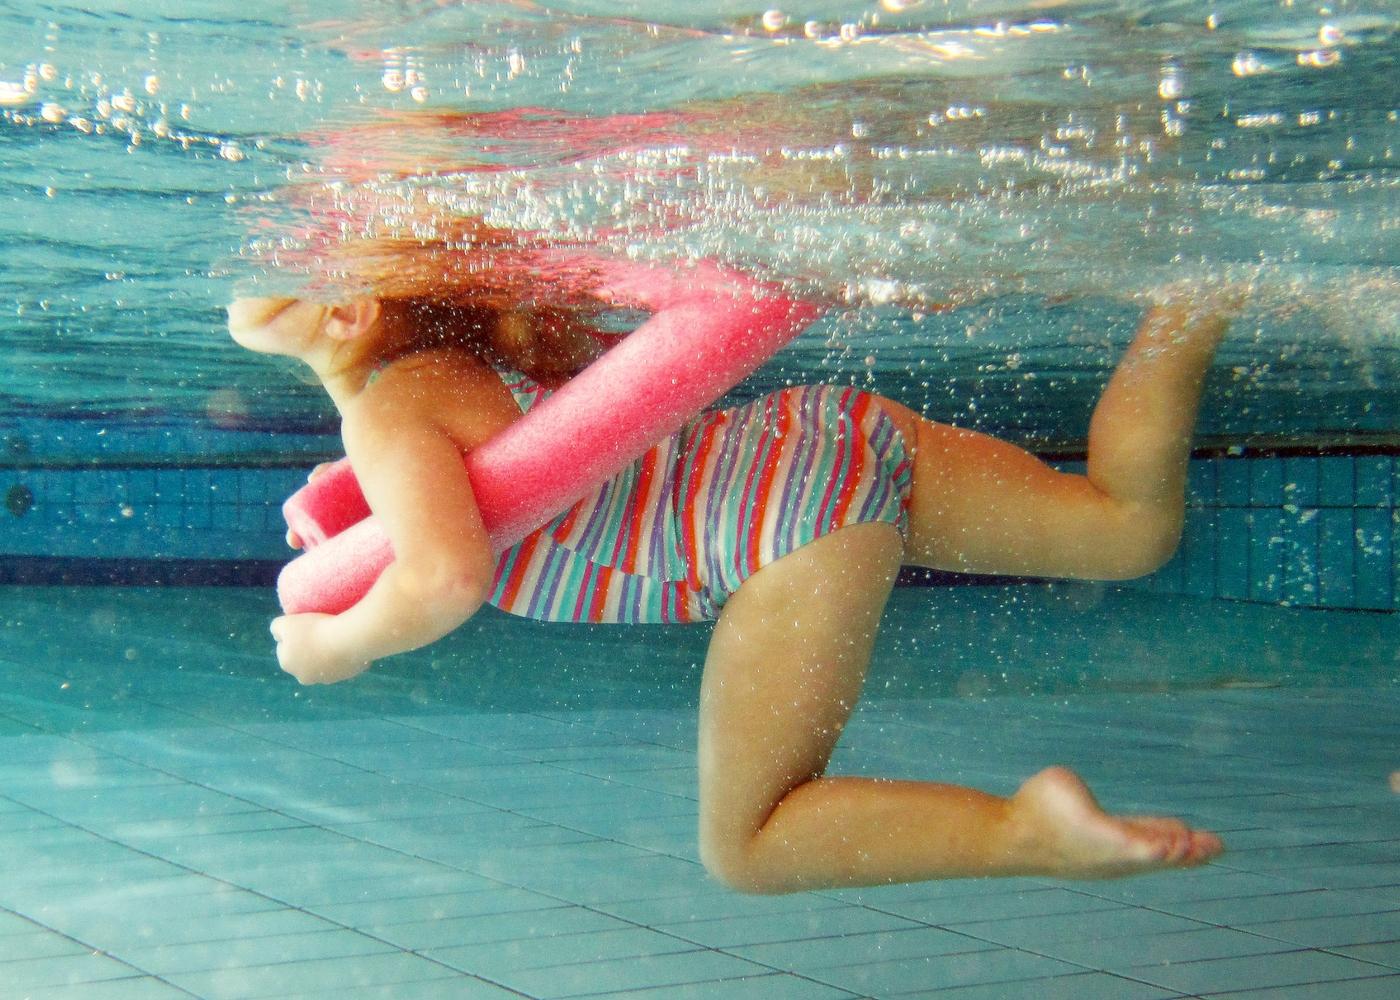 Menina com bóia na piscina